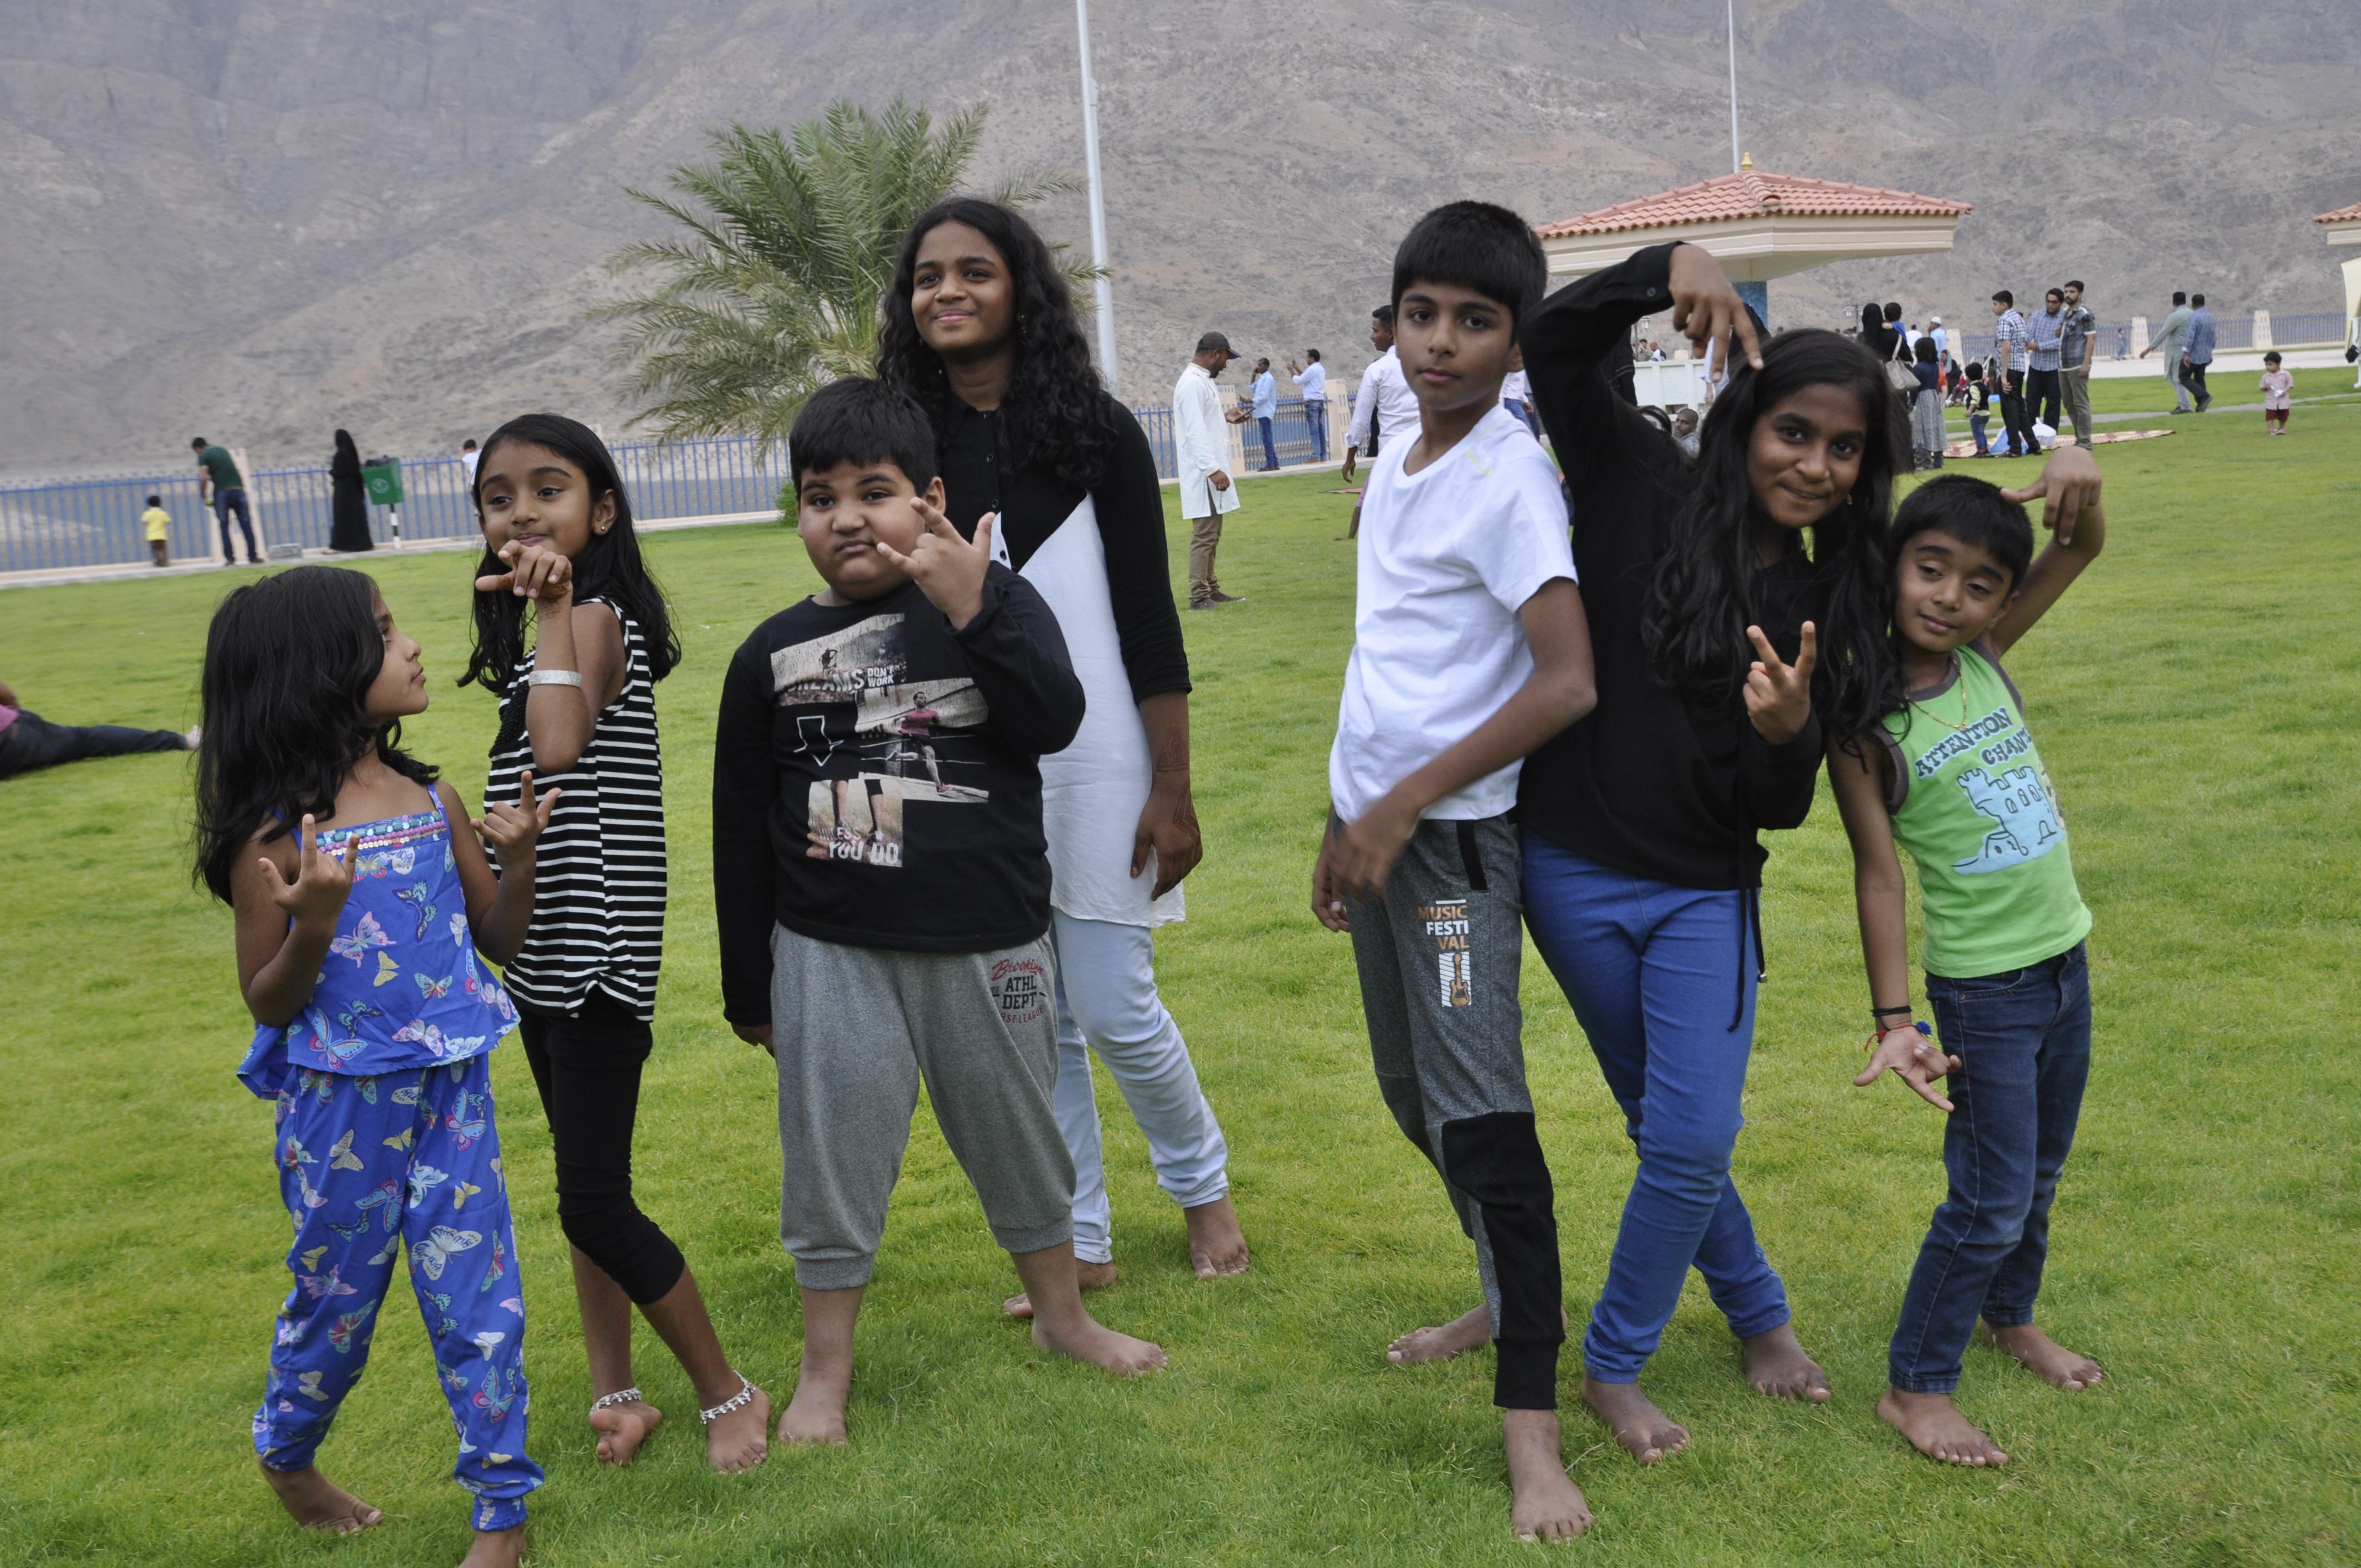 Huge footfall at Omani tourist sites during Eid holidays